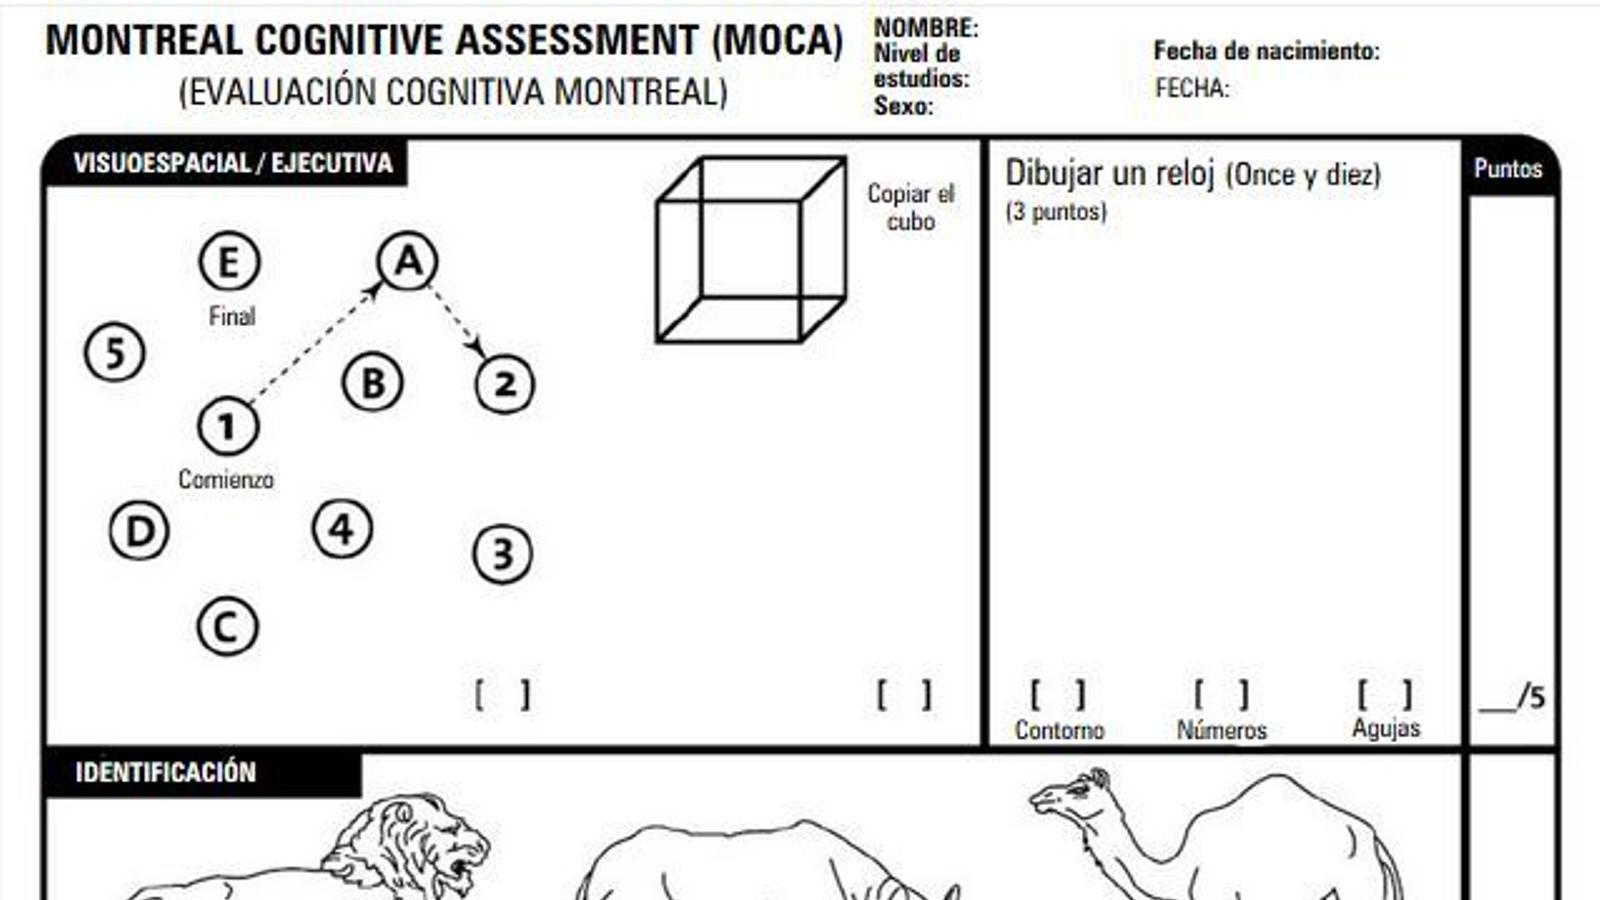 Test de Montreal sobre demència